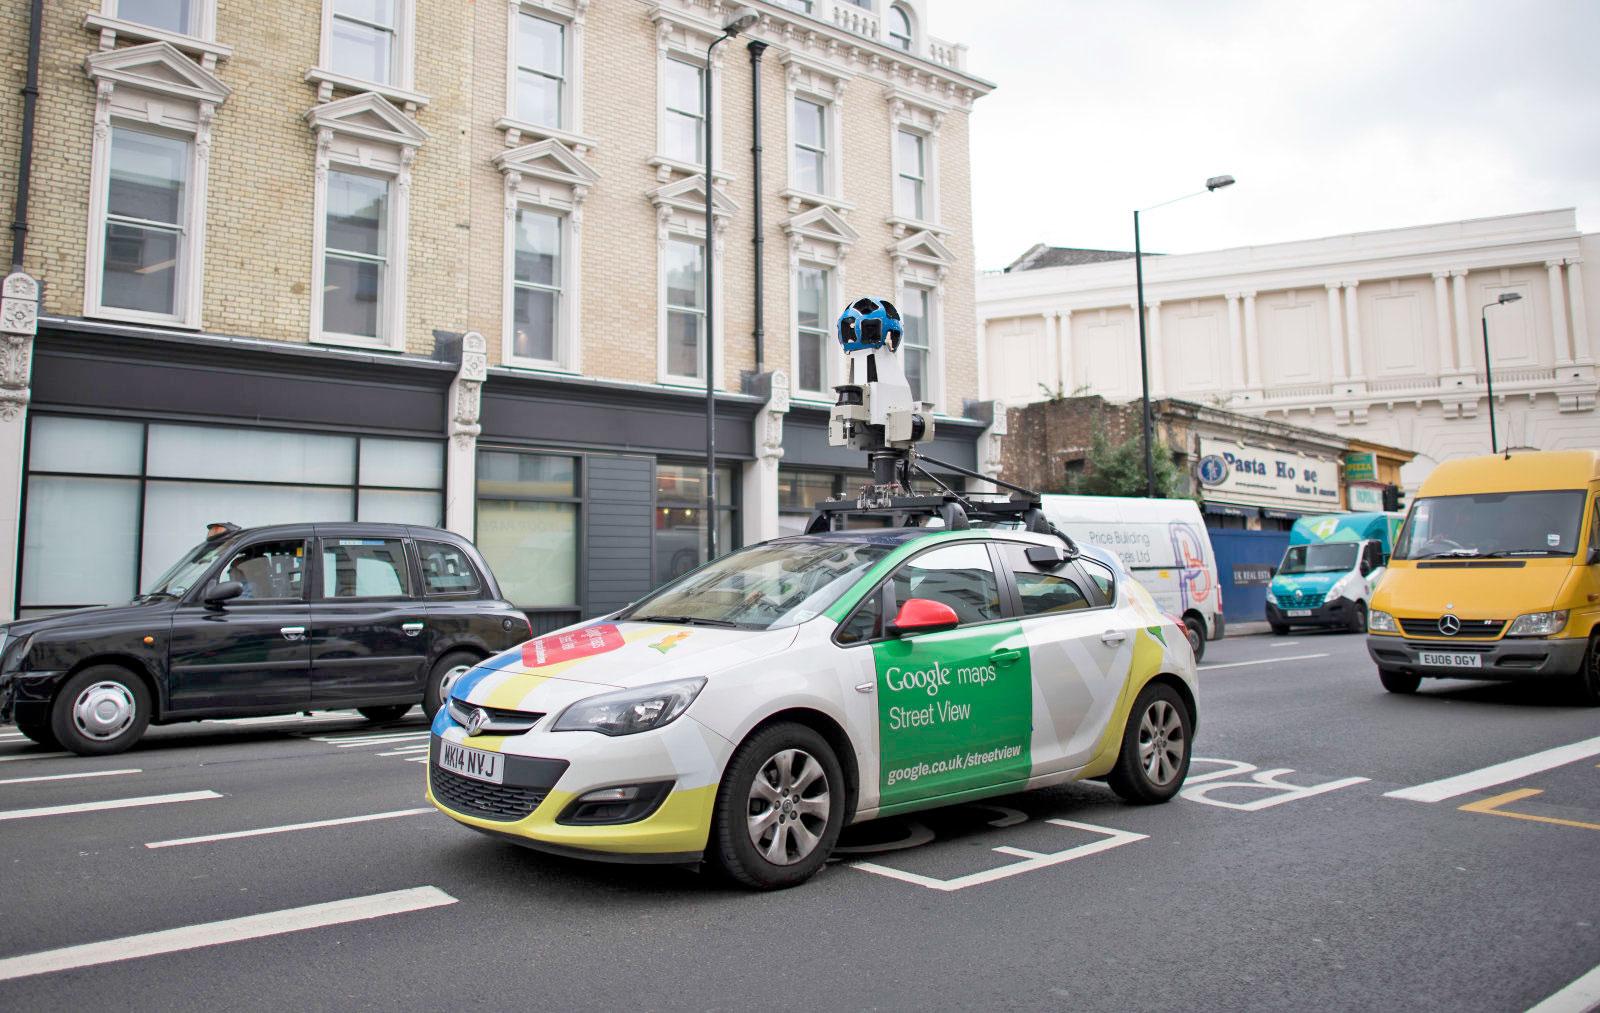 Google 街景车即将开启监测空气质量的职能